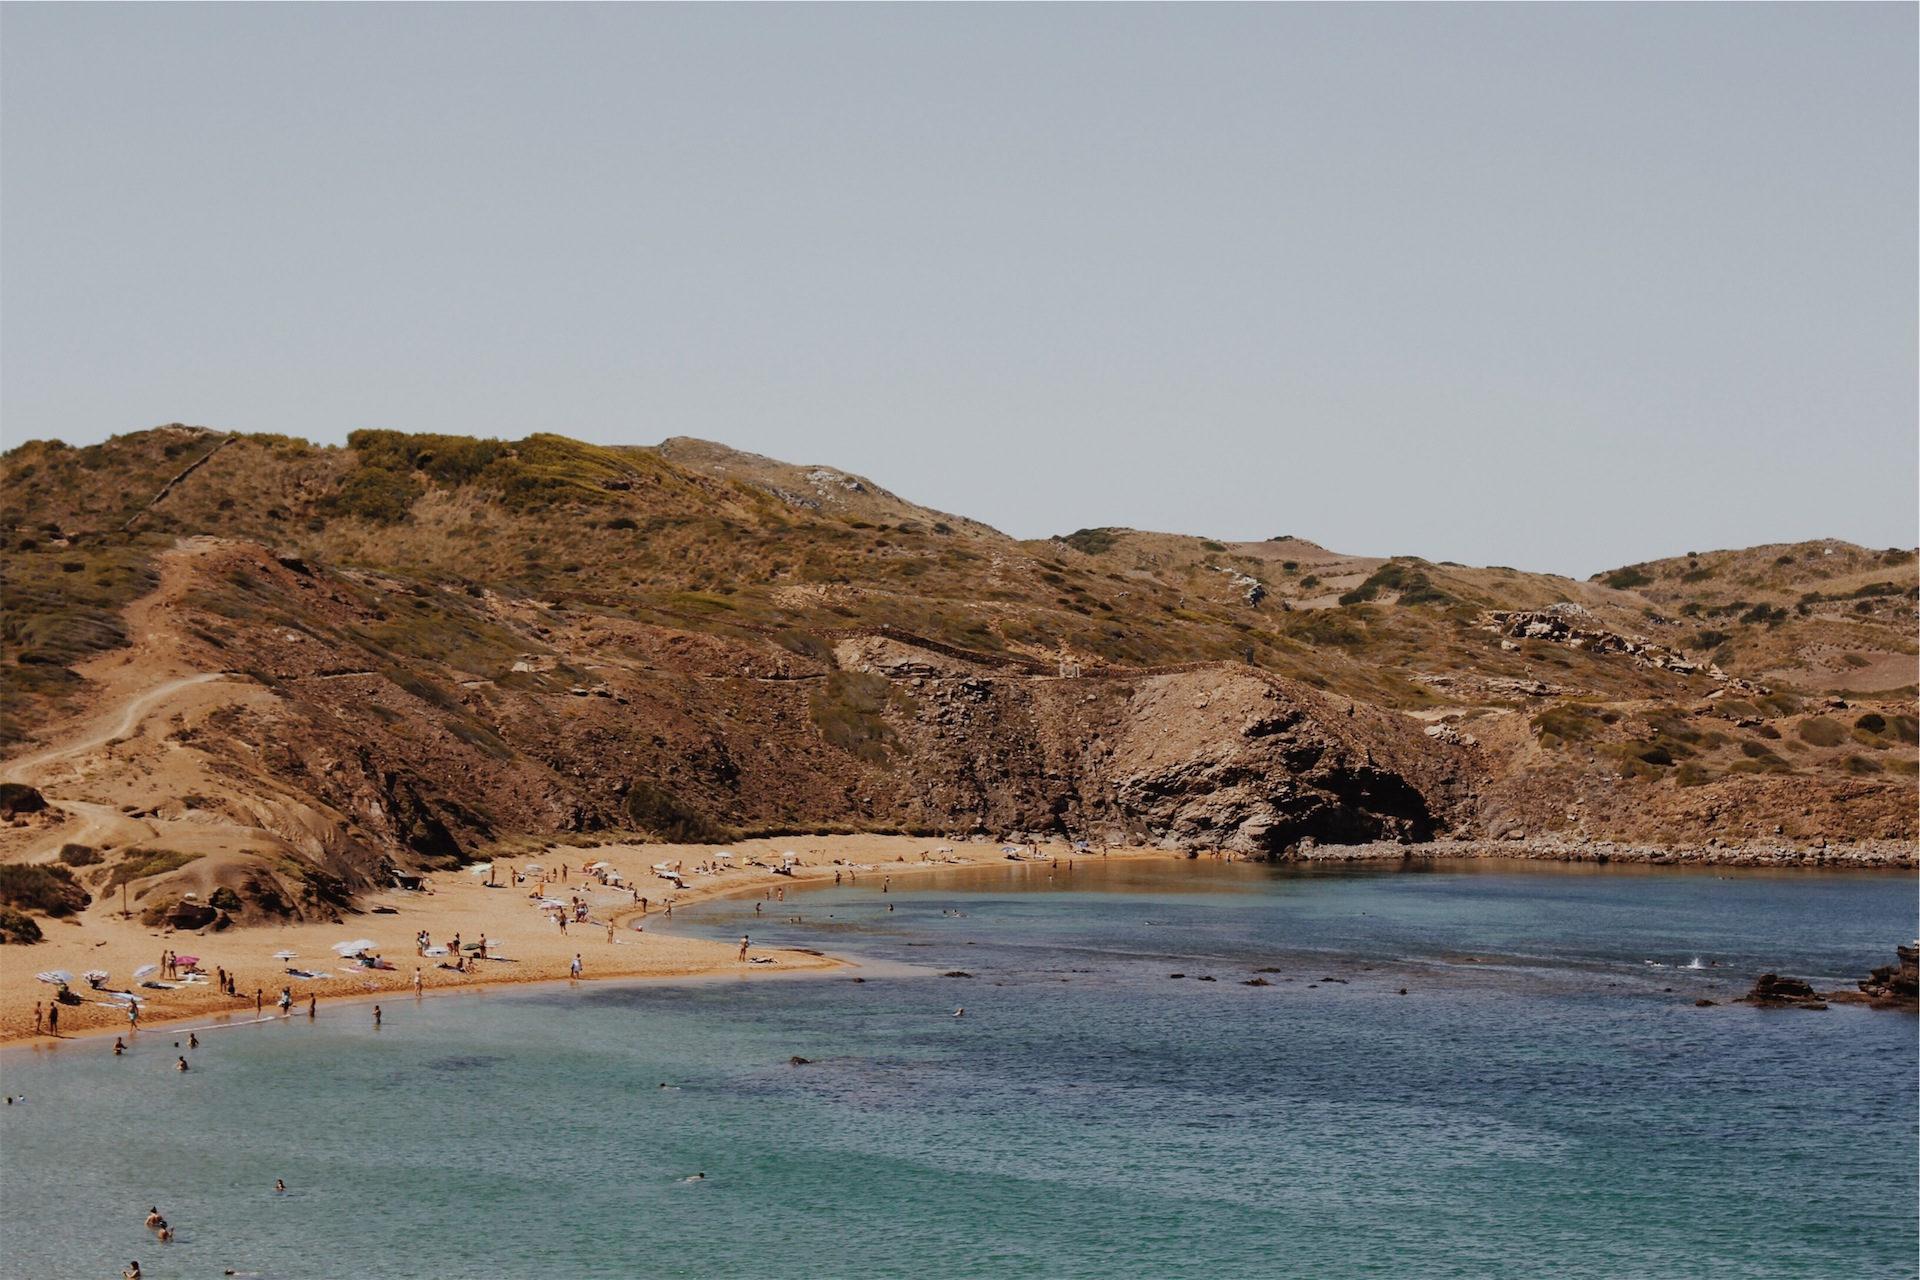 समुद्र तट, virgen, जंगली, लोग, छुट्टी - HD वॉलपेपर - प्रोफेसर-falken.com